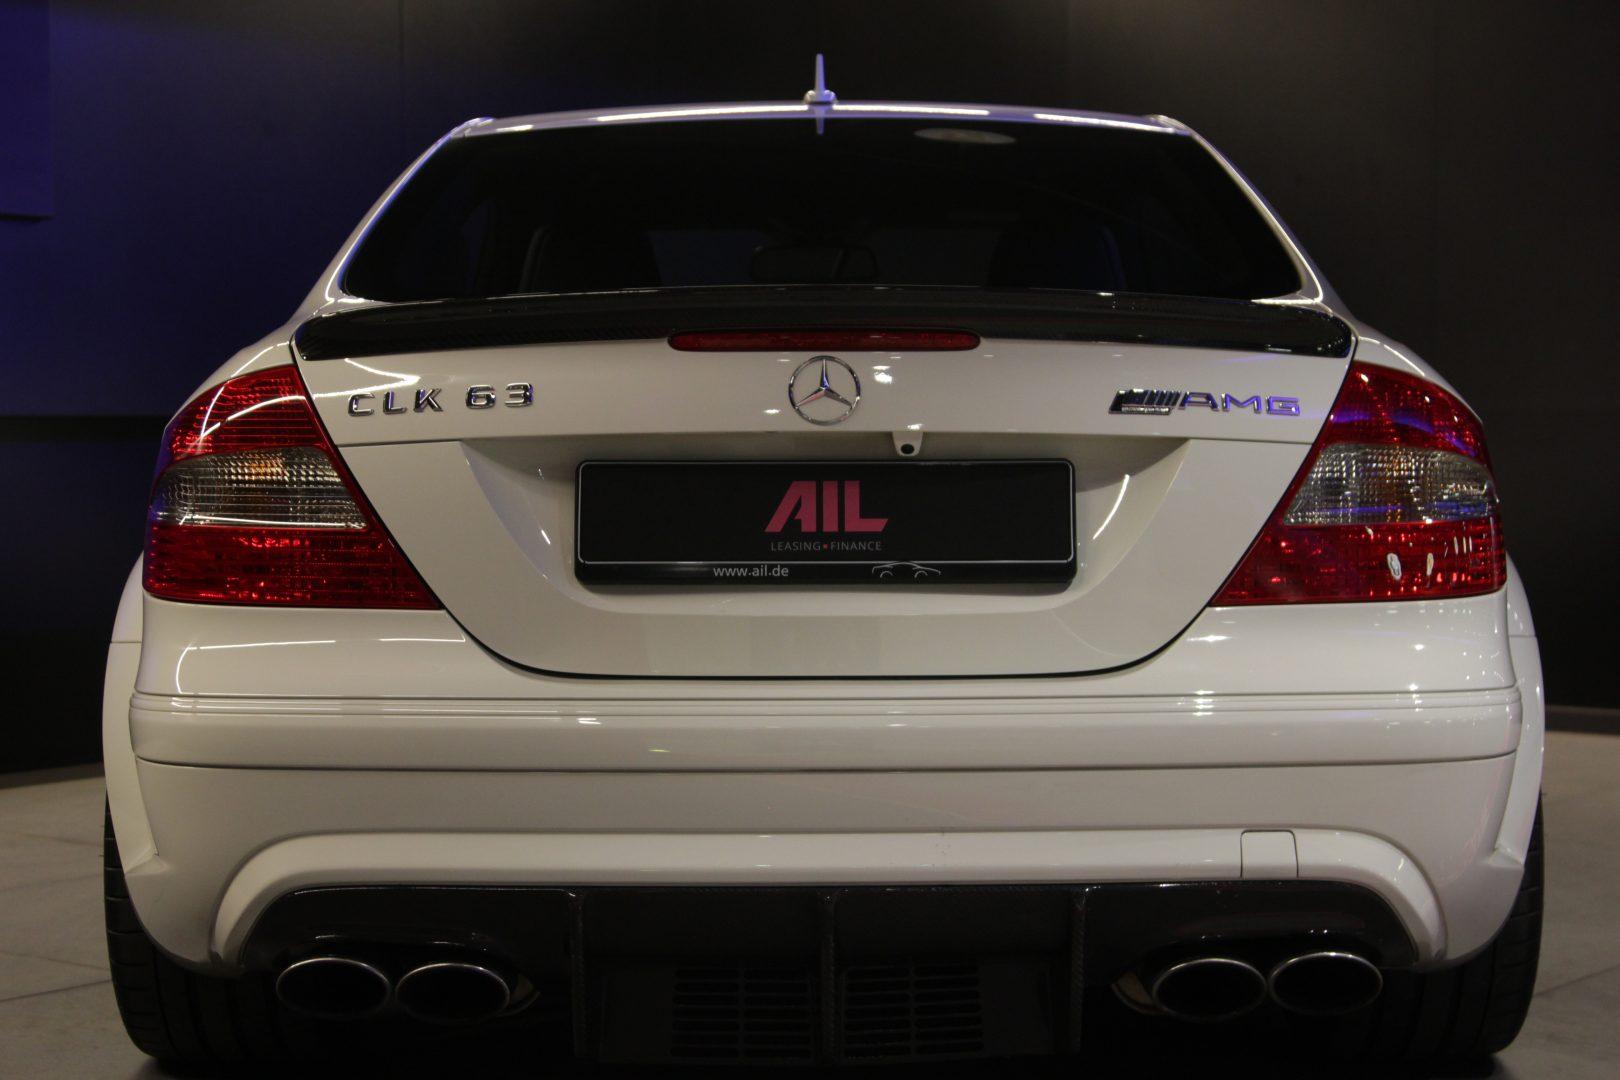 AIL Mercedes-Benz CLK 63 AMG Black Series 2